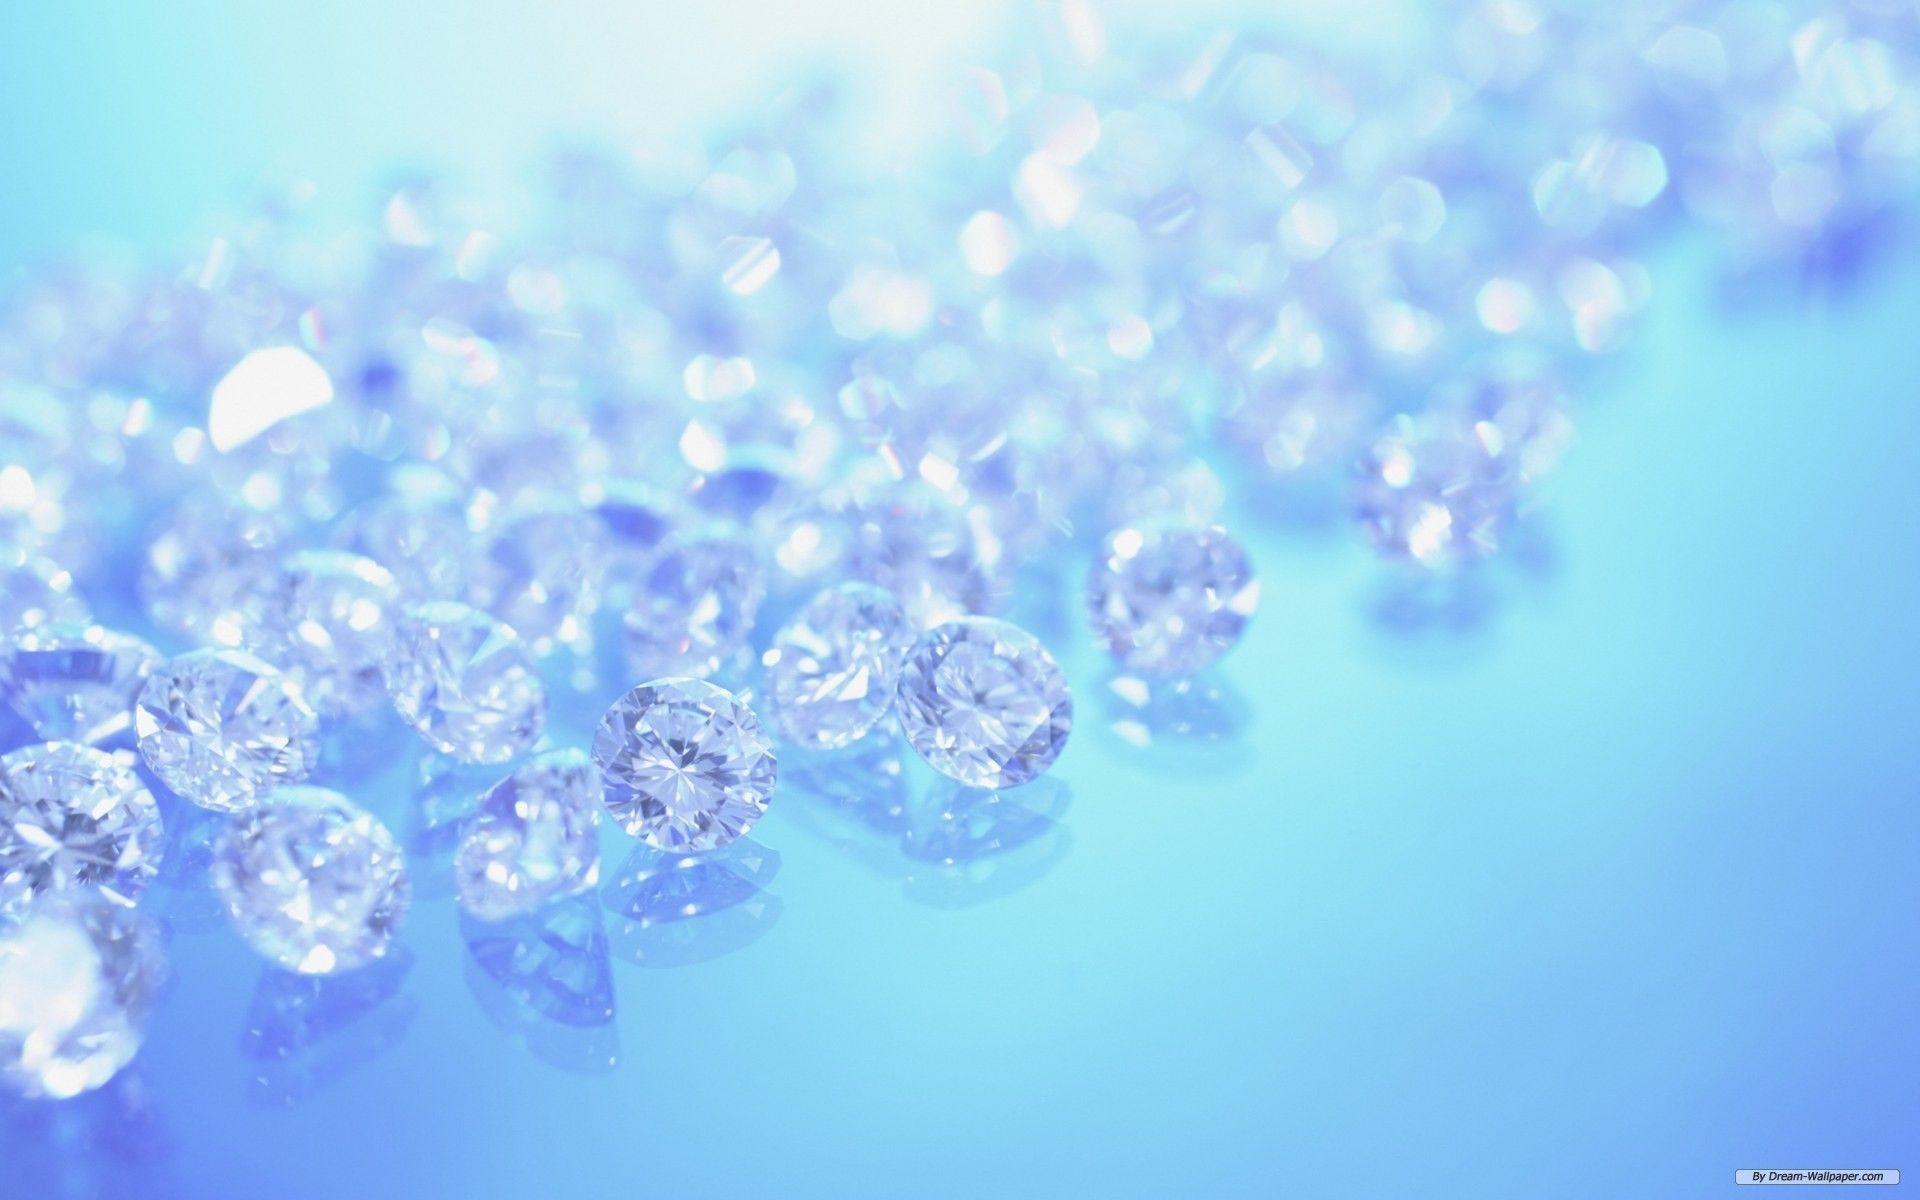 Diamond Wallpaper 44 393287 High Definition Wallpapers  wallalay.